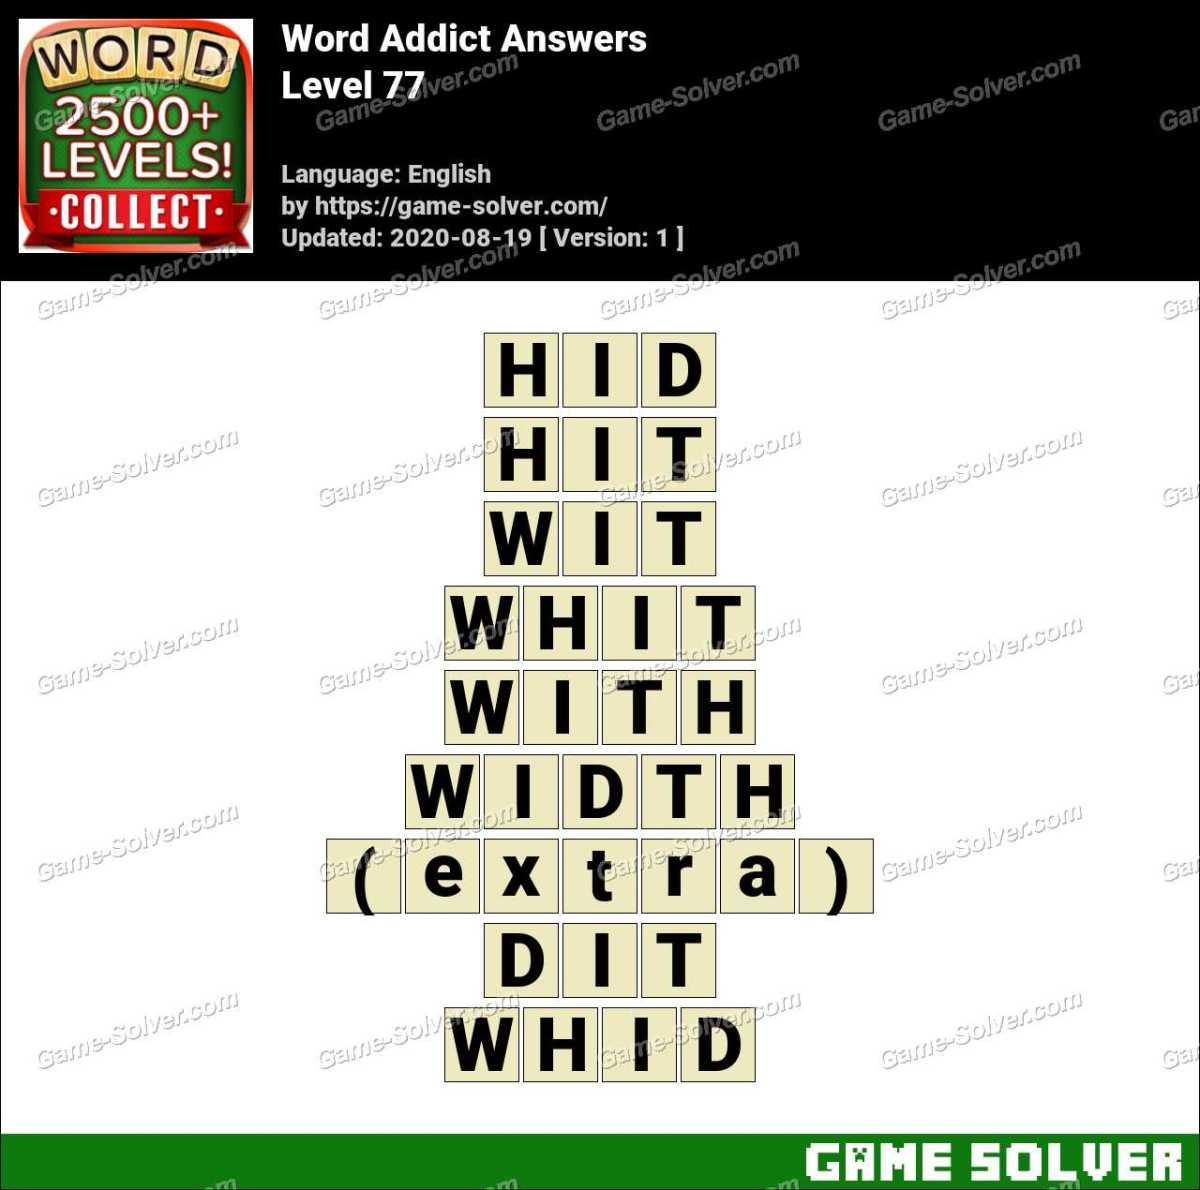 Word Addict Level 77 Answers